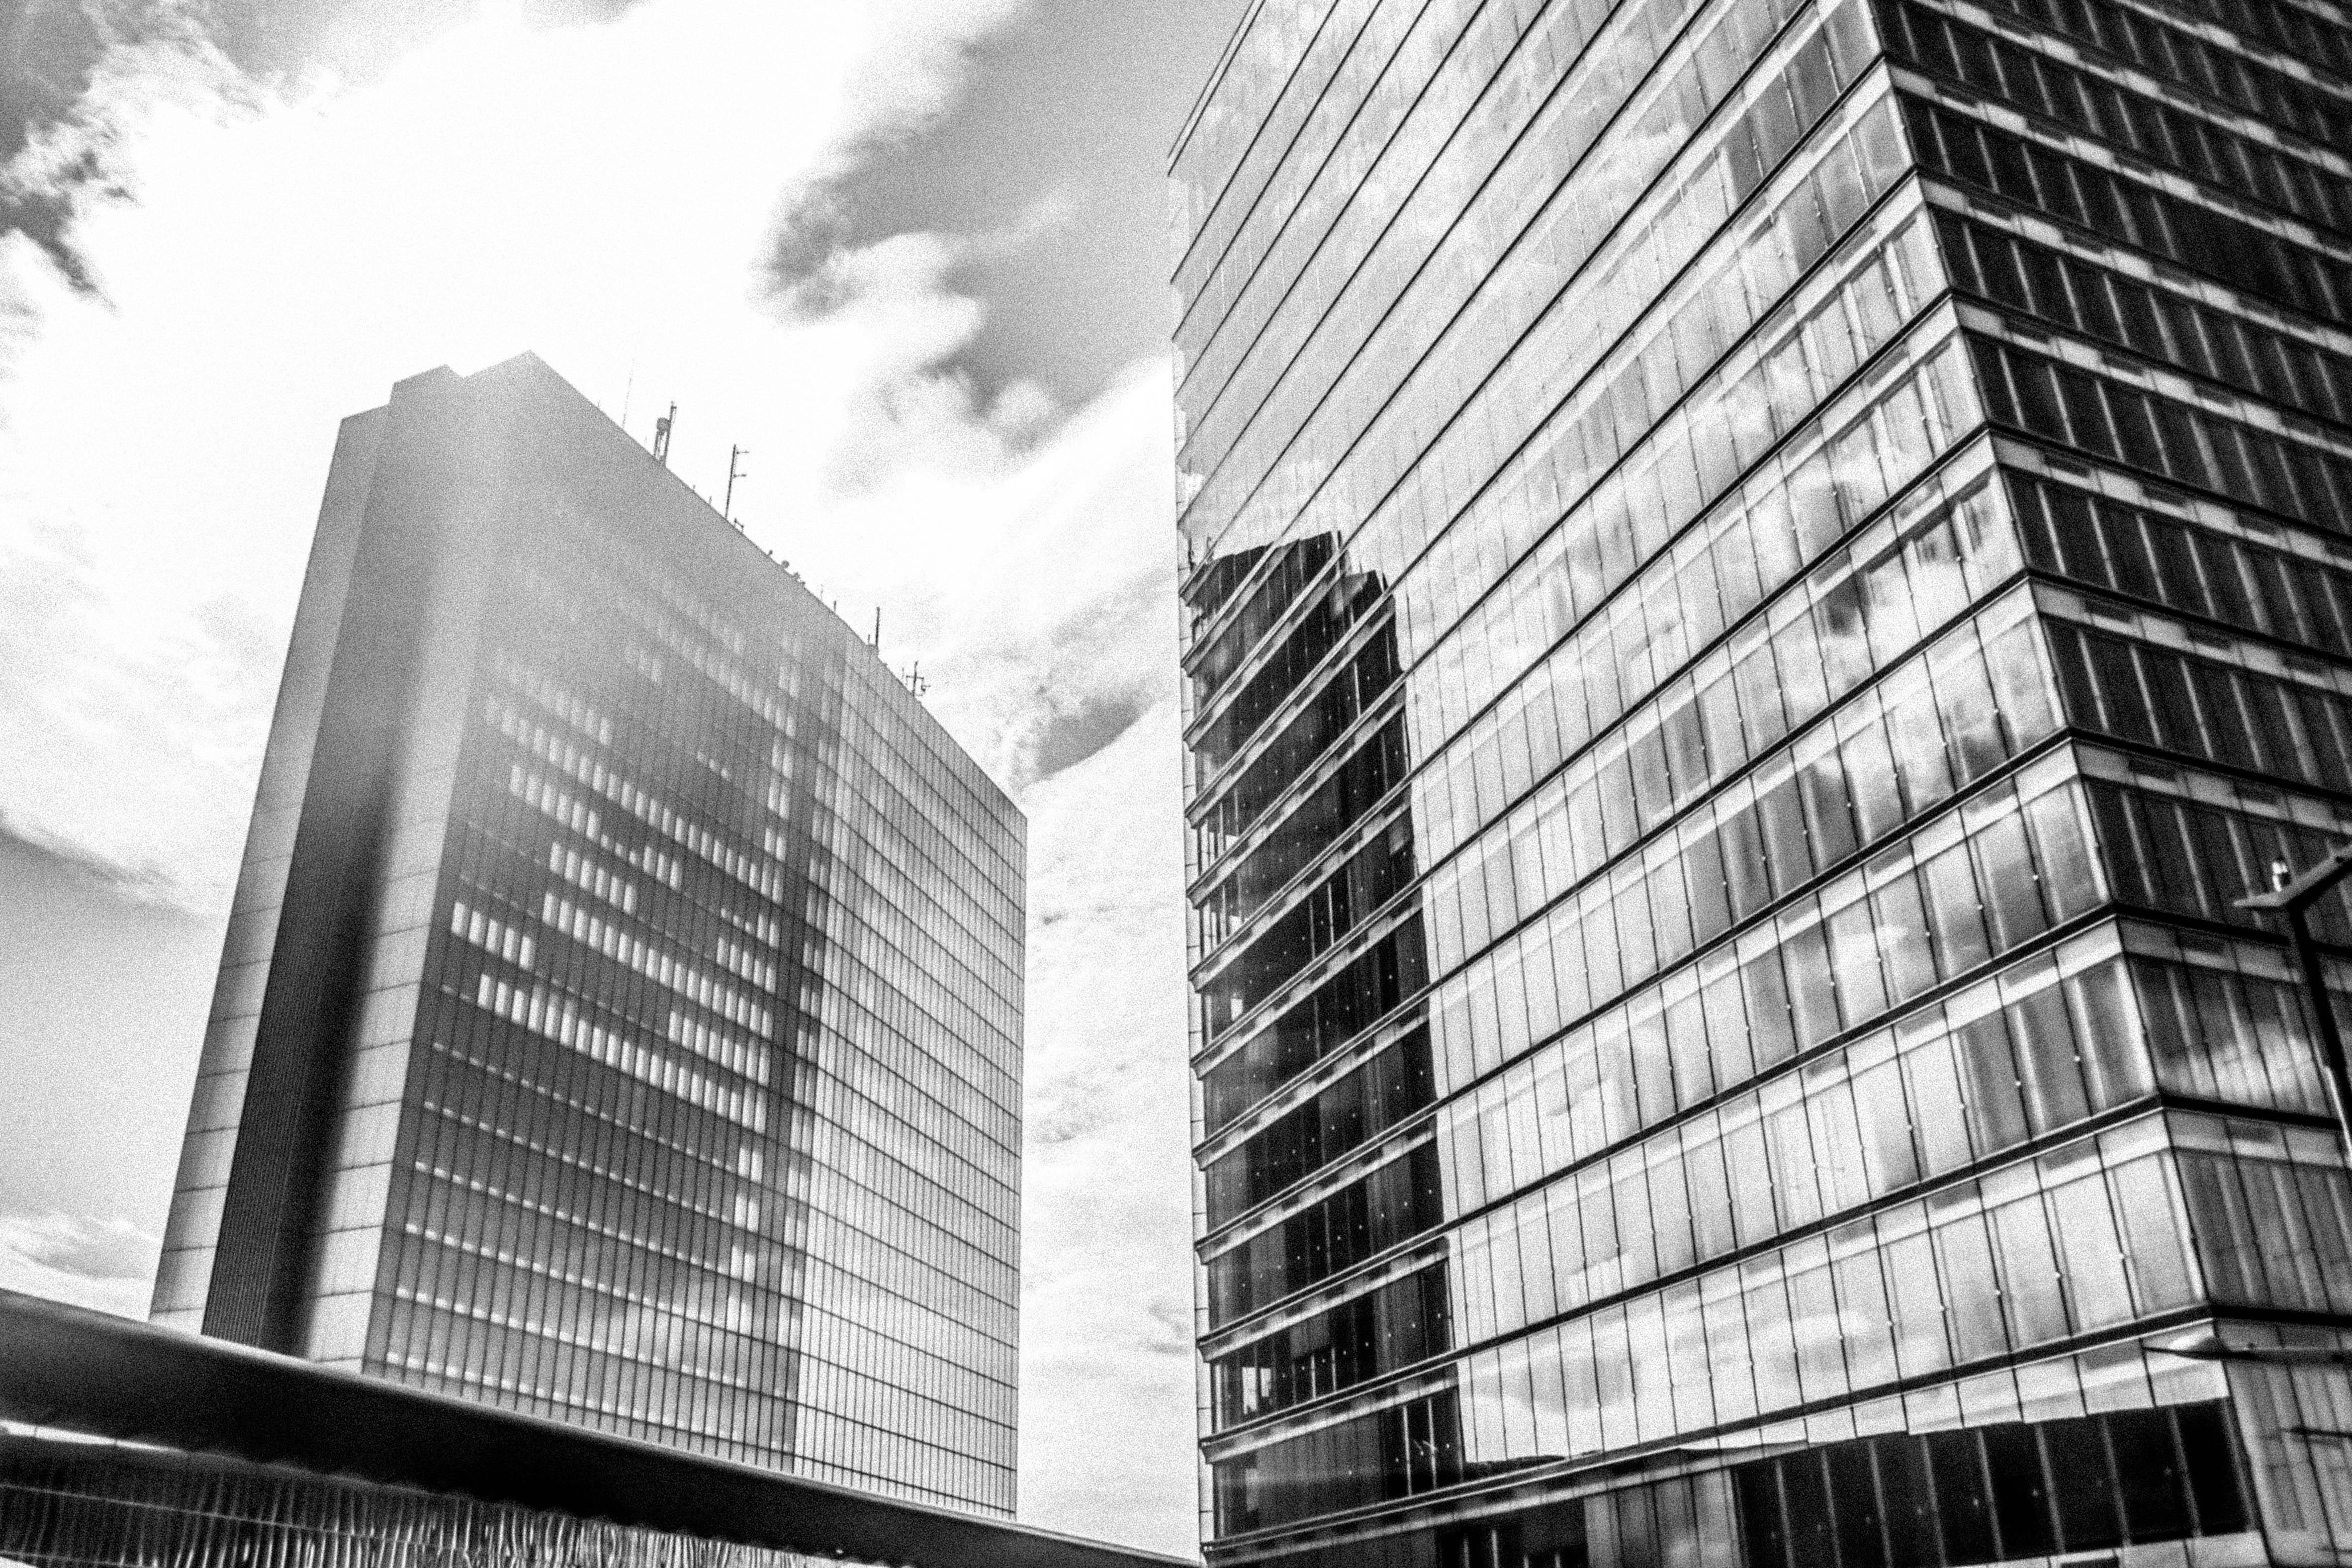 windows-skyscraper-business-reflect-office-PGZWL9F-73